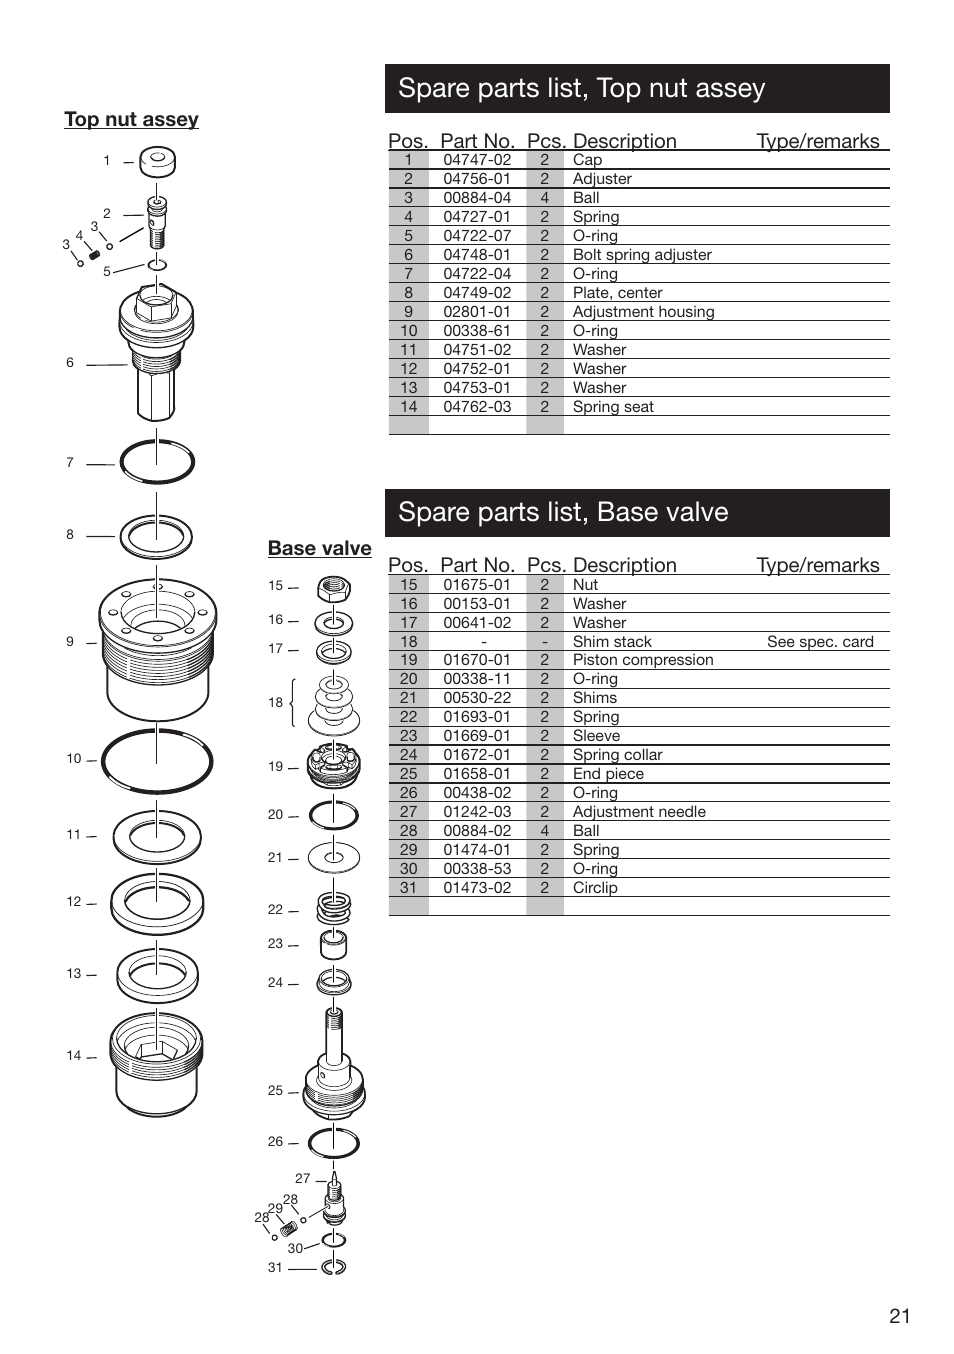 Spare parts list, top nut assey, Spare parts list, base